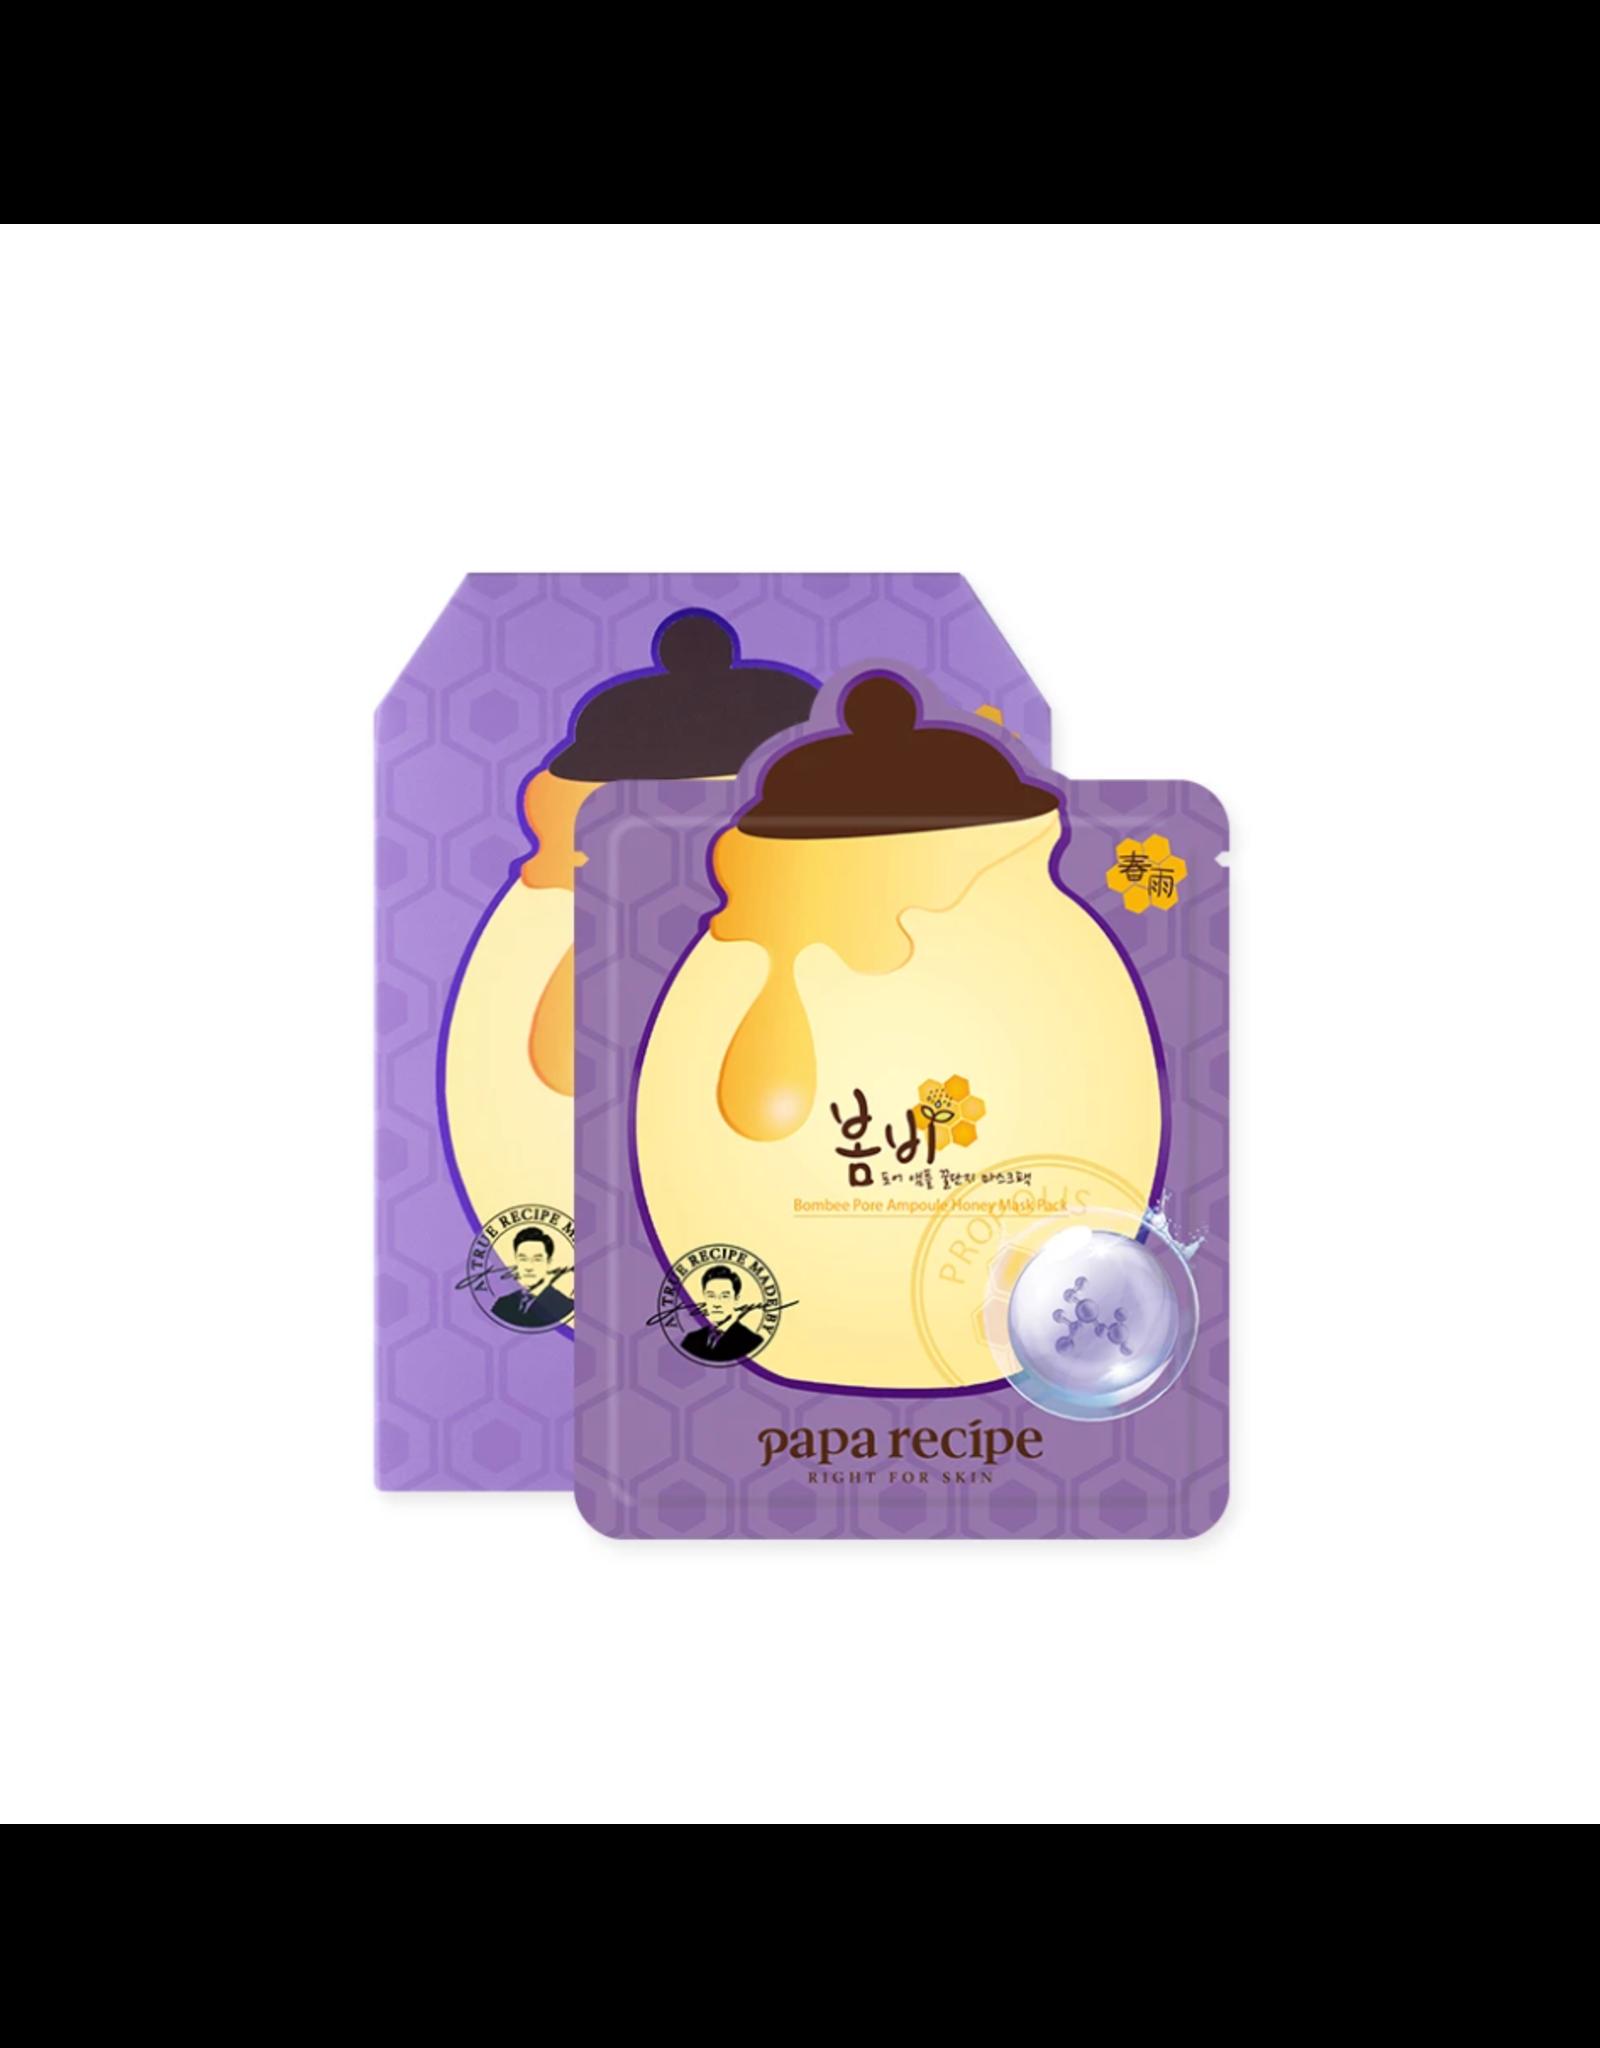 Papa Recipe PAPA Recipe Pore Ampoule Honey Mask Purple